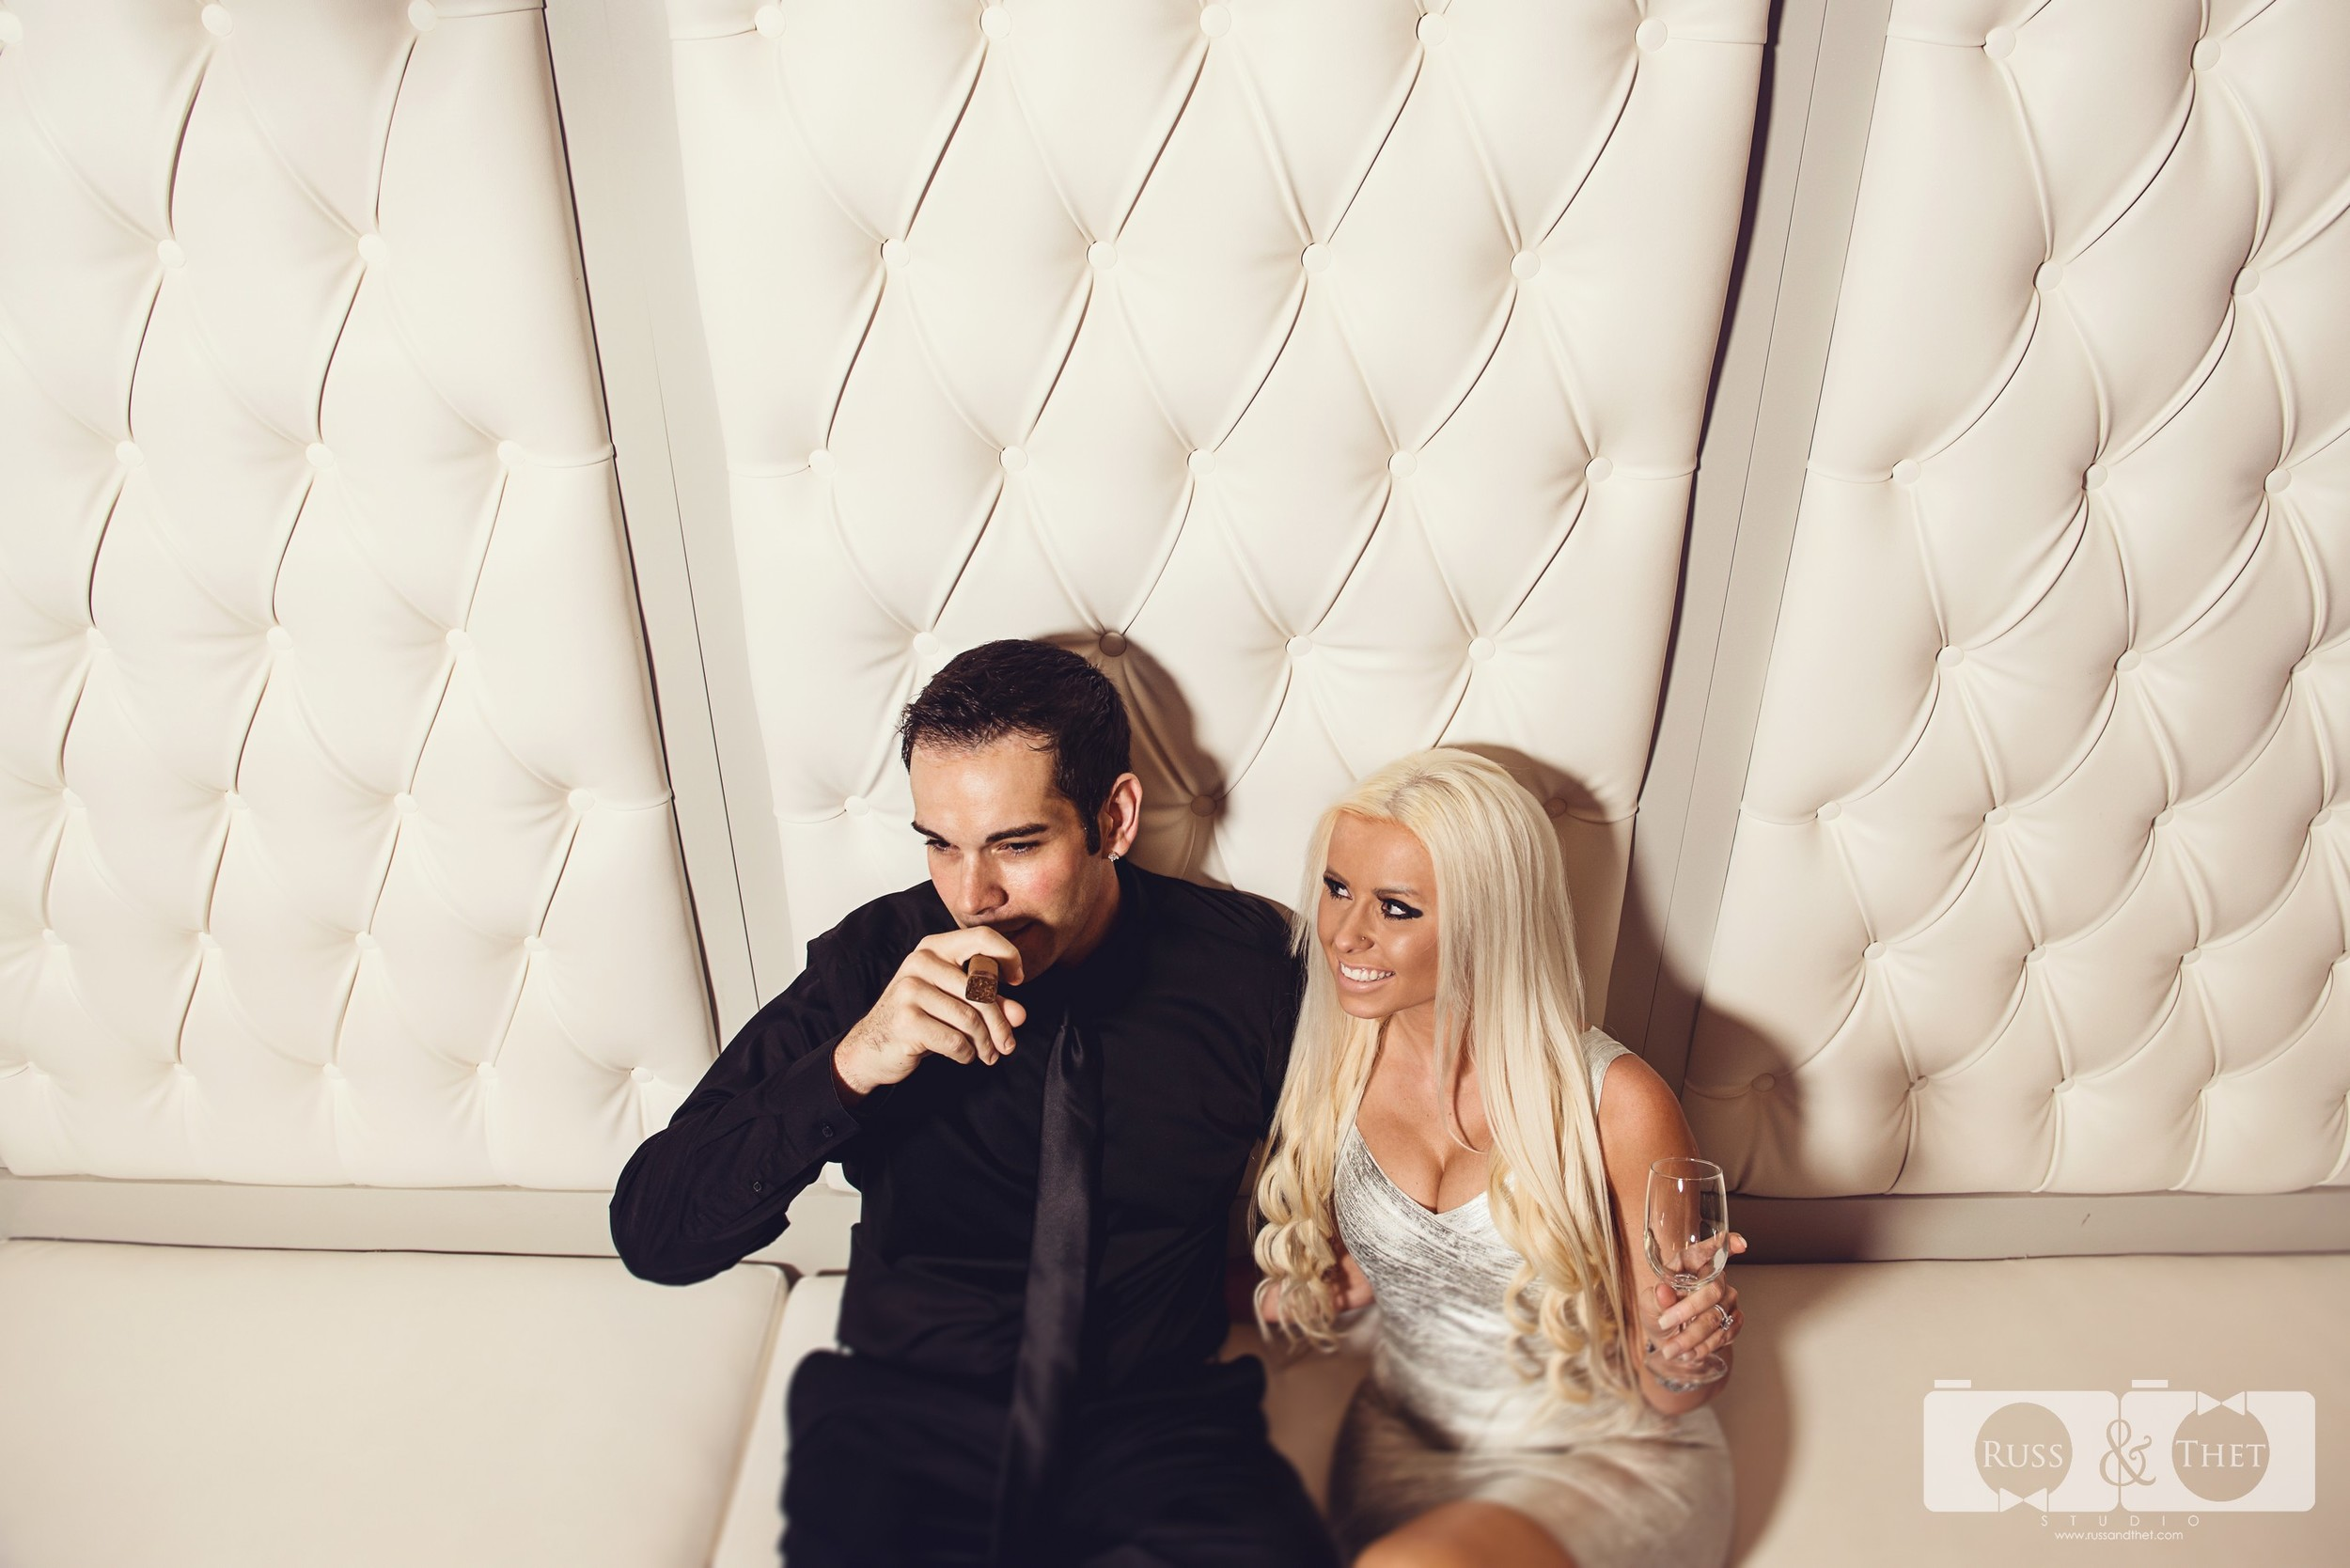 Jon&Kimee-The-Hills-Hotel-Engagement-Photographer (35).jpg